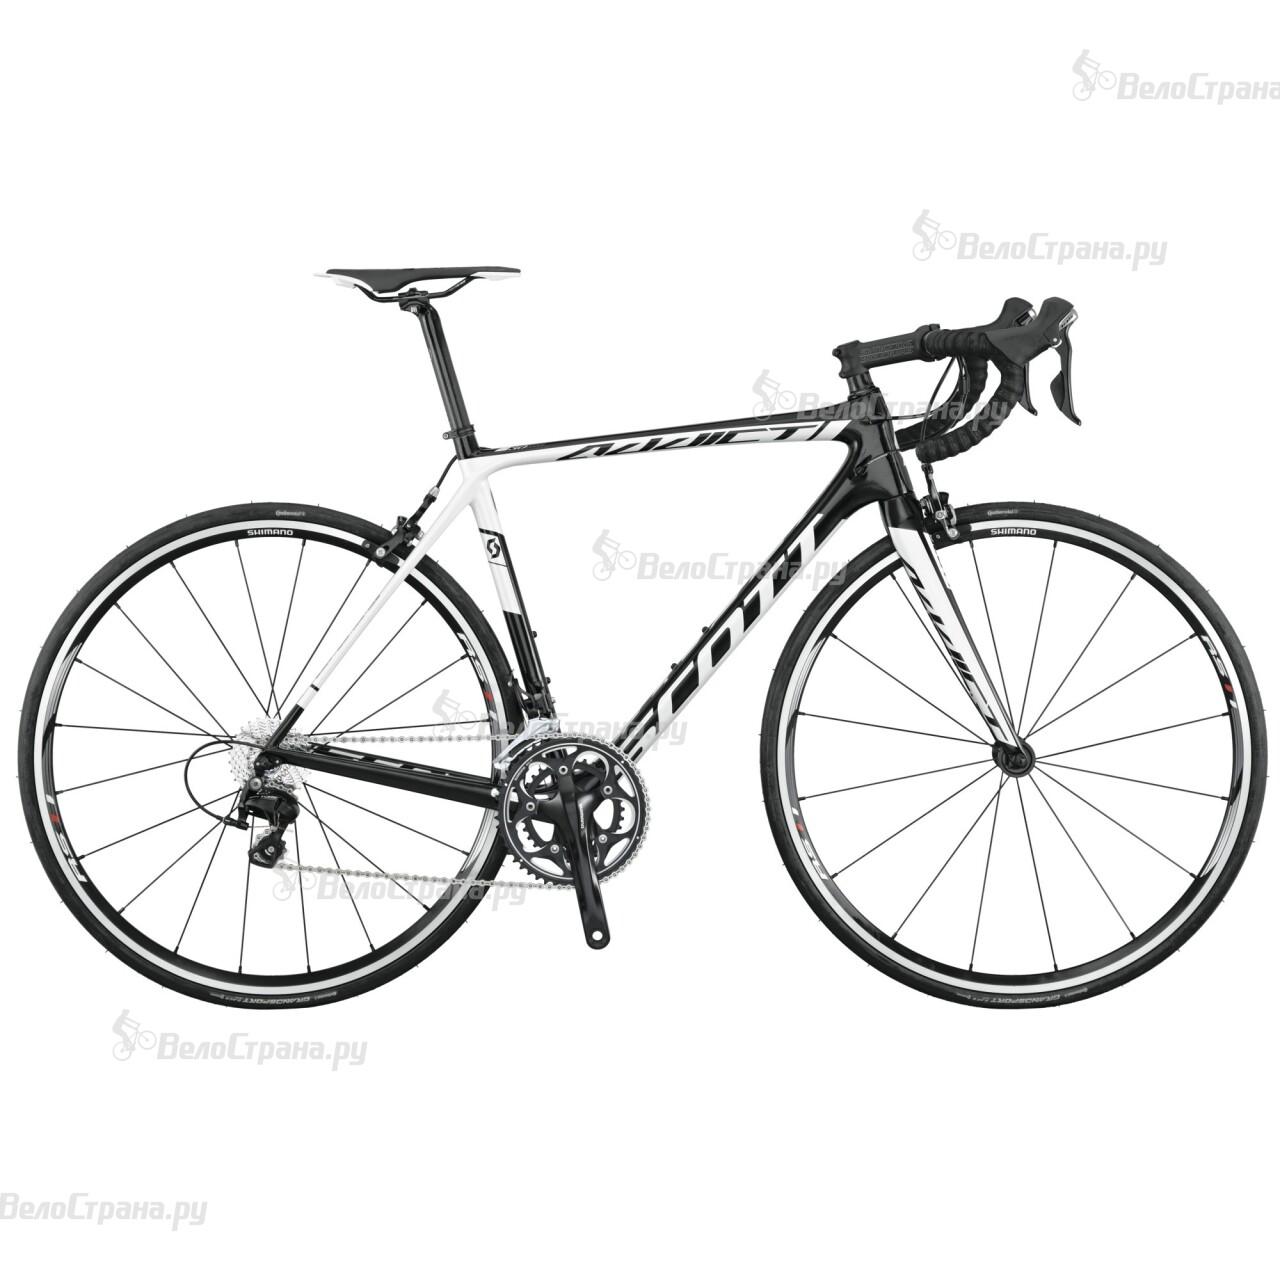 Велосипед Scott Addict 30 (2015) scott addict sl compact 2015